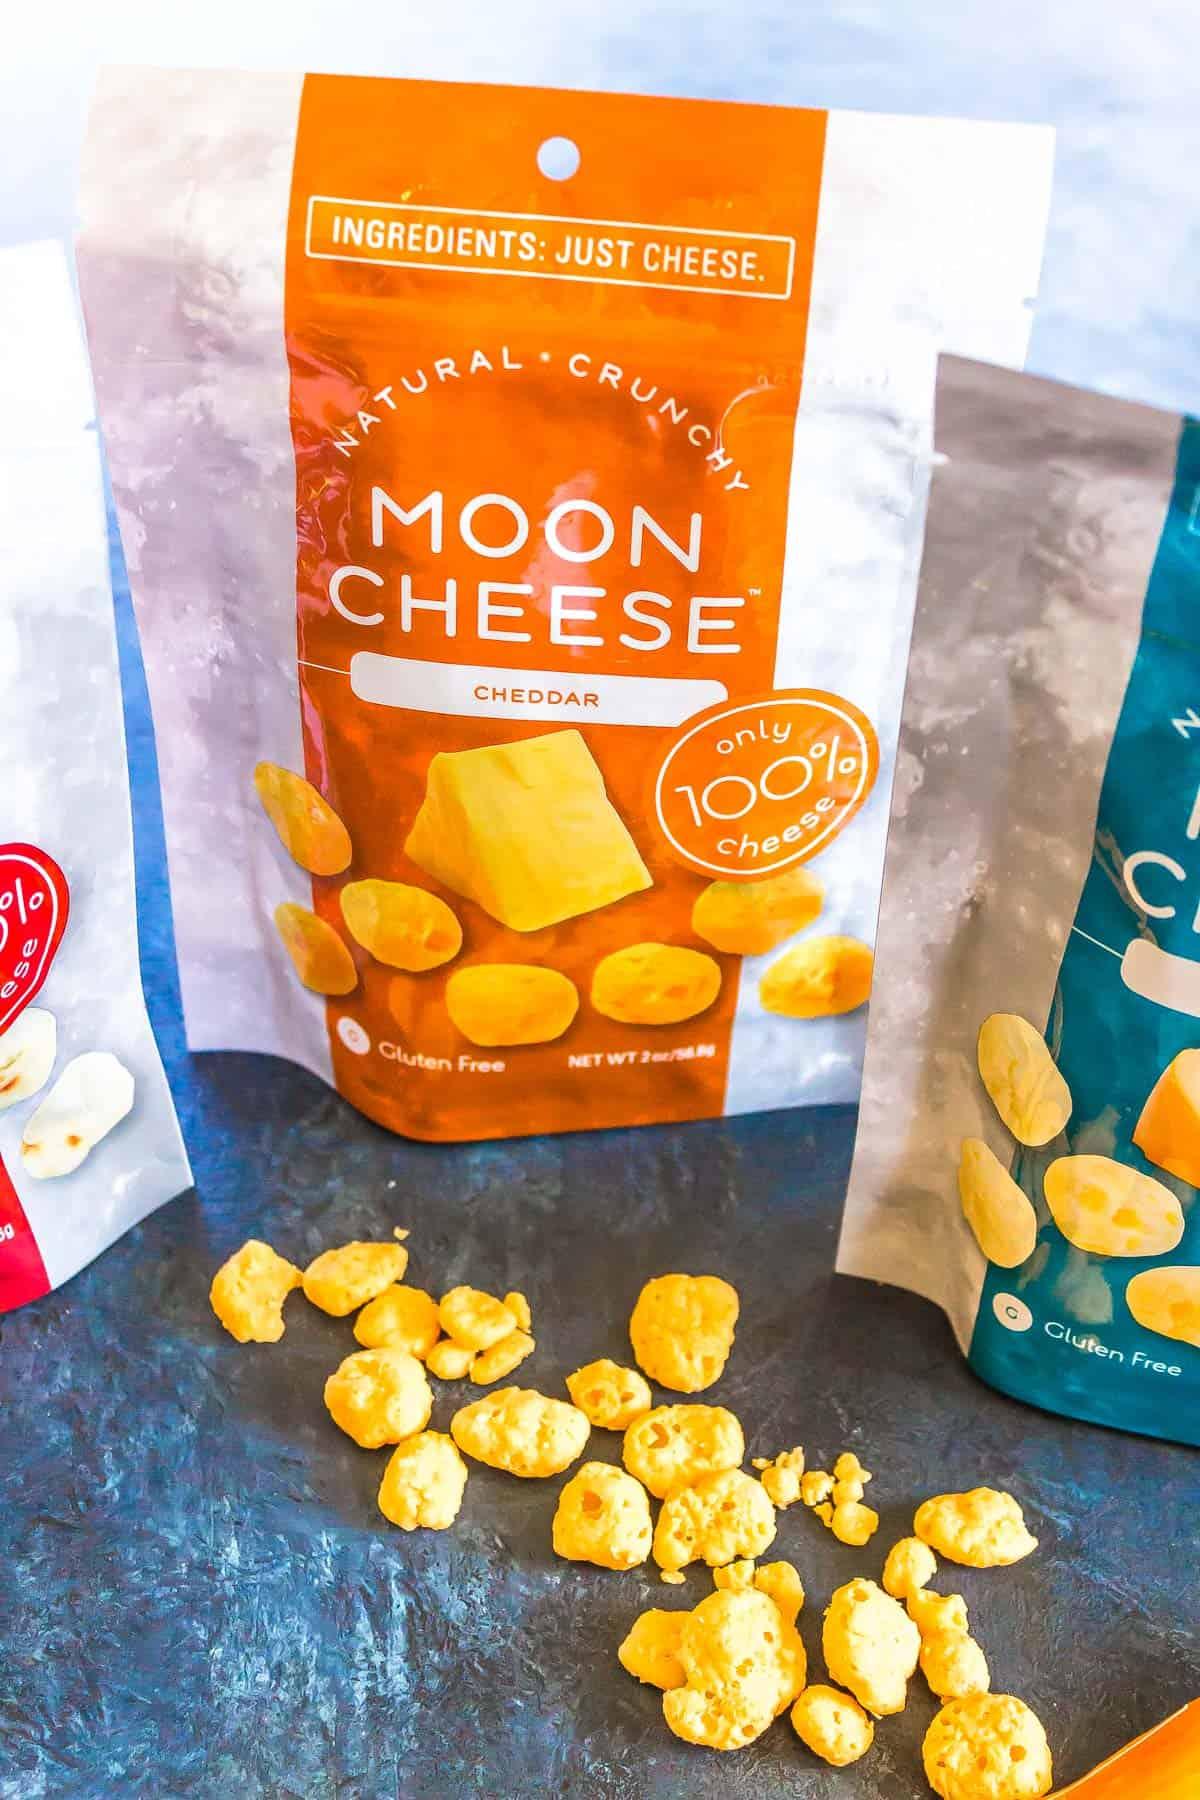 Moon cheese packaging